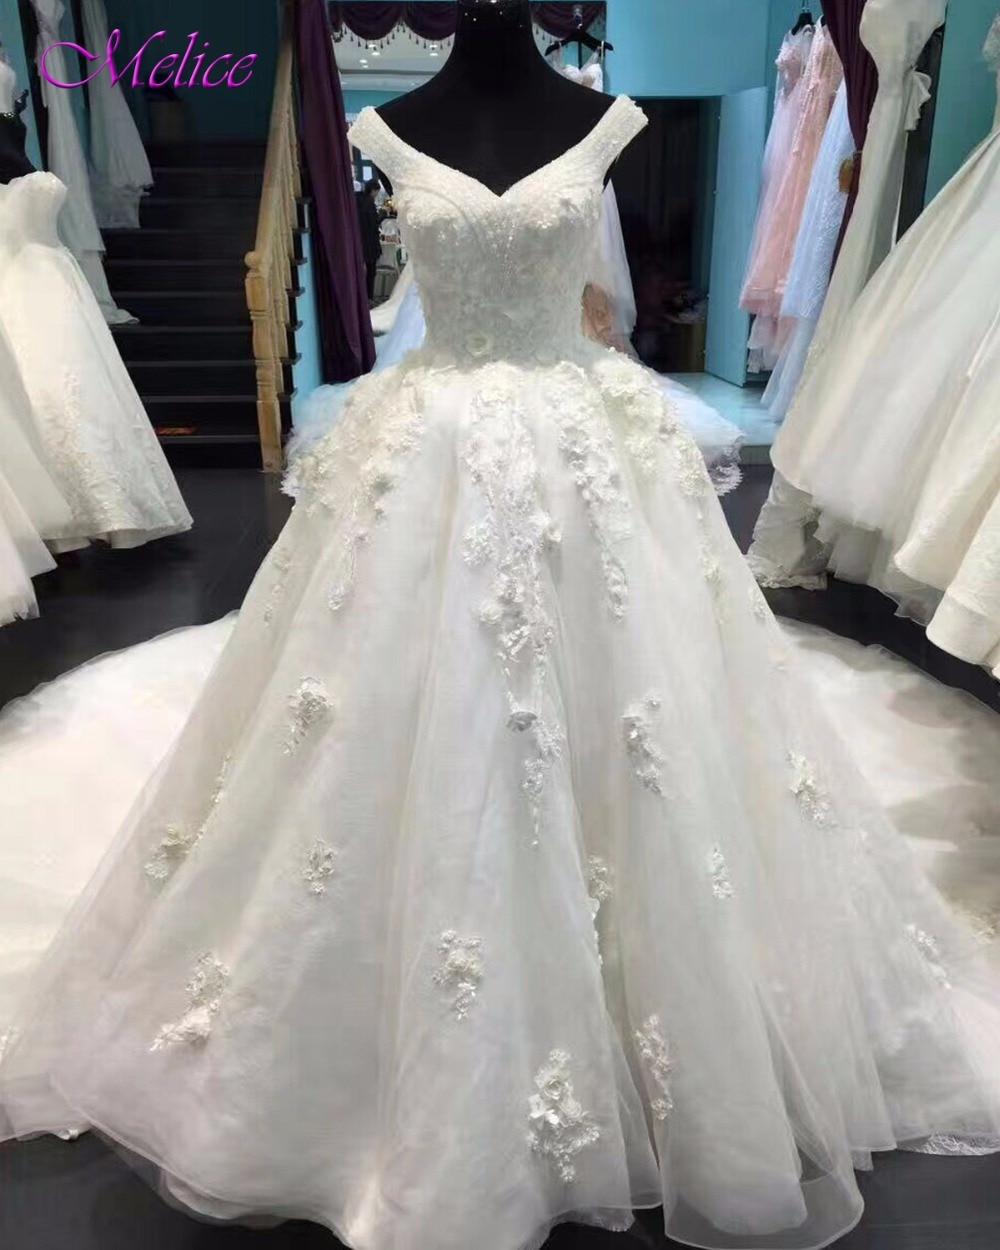 Melice Luxury Beaded Sweetheart Neck Lace Up Ball Gown Wedding Dresses 2020 Appliques Chapel Train Bridal Dress Vestido de Noiva